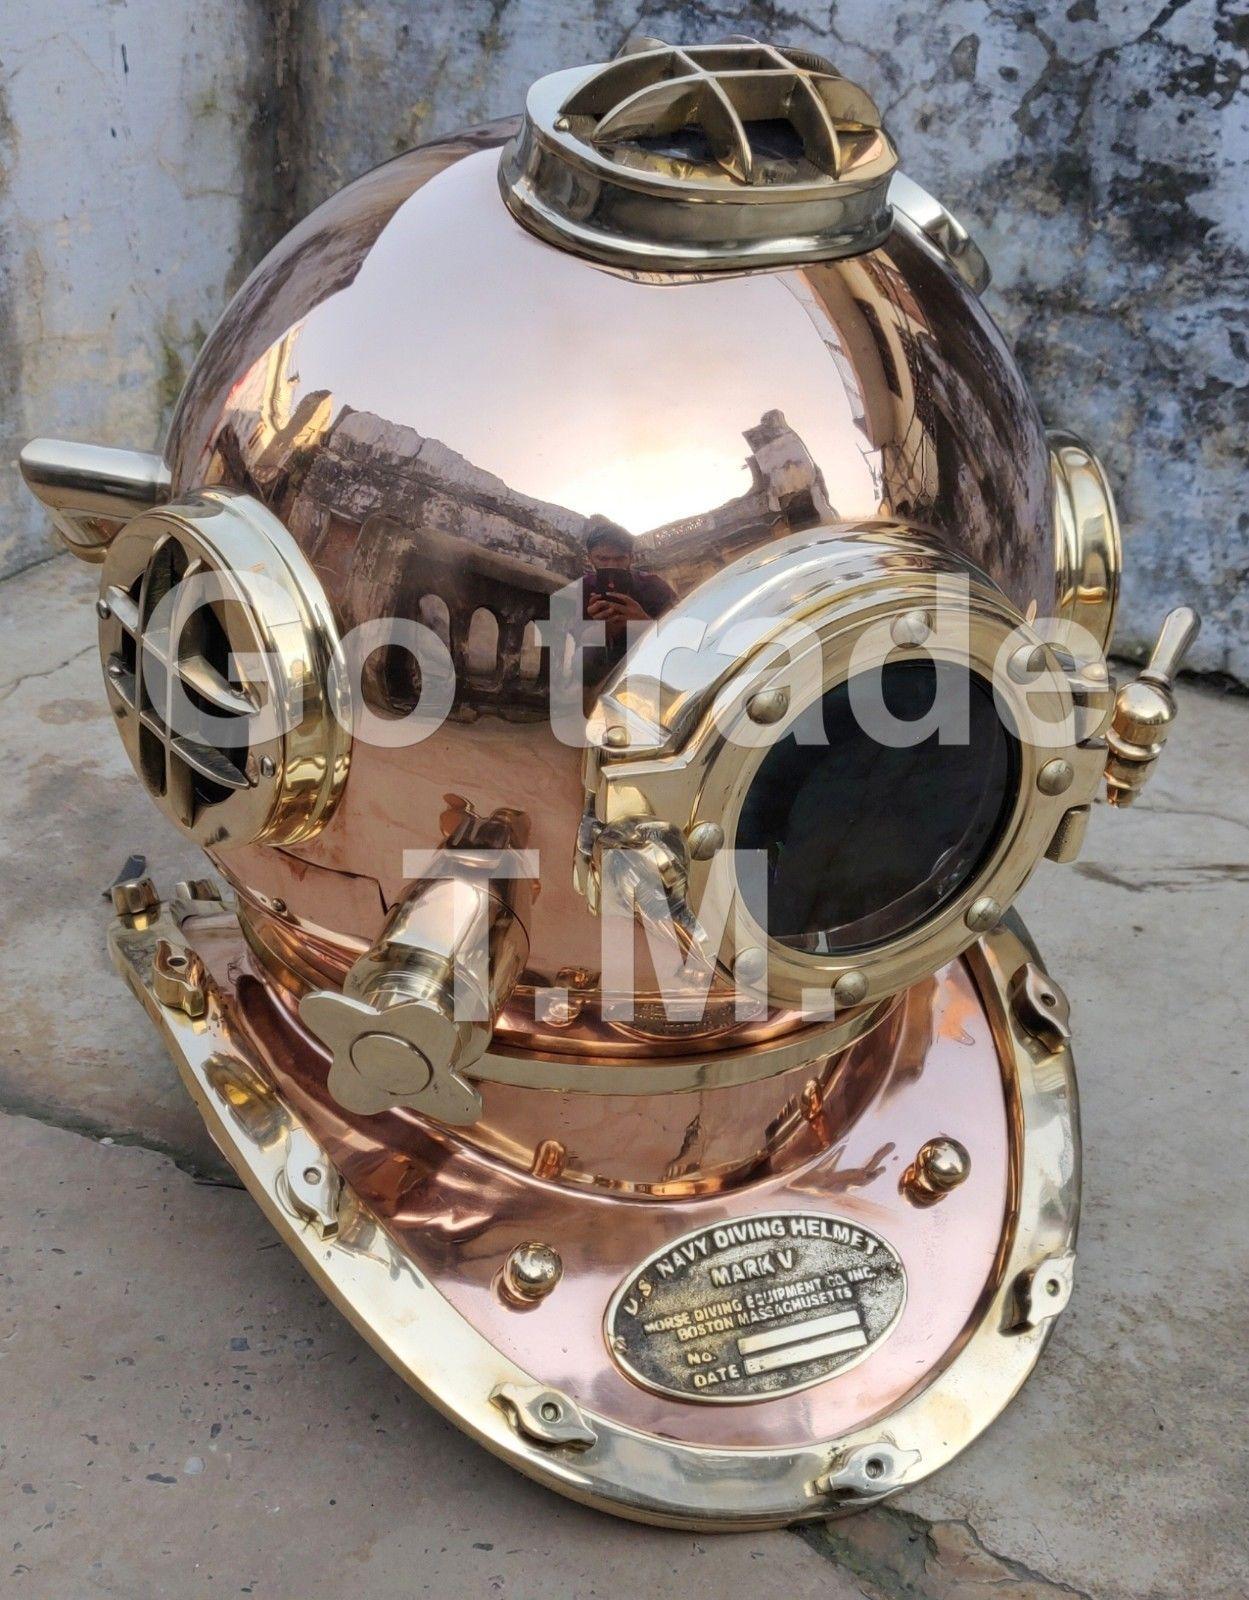 Maritime Us Navy Boston Dive Helmet Scuba Mark V Diving Divers Helmet Christmas Gift Antiques